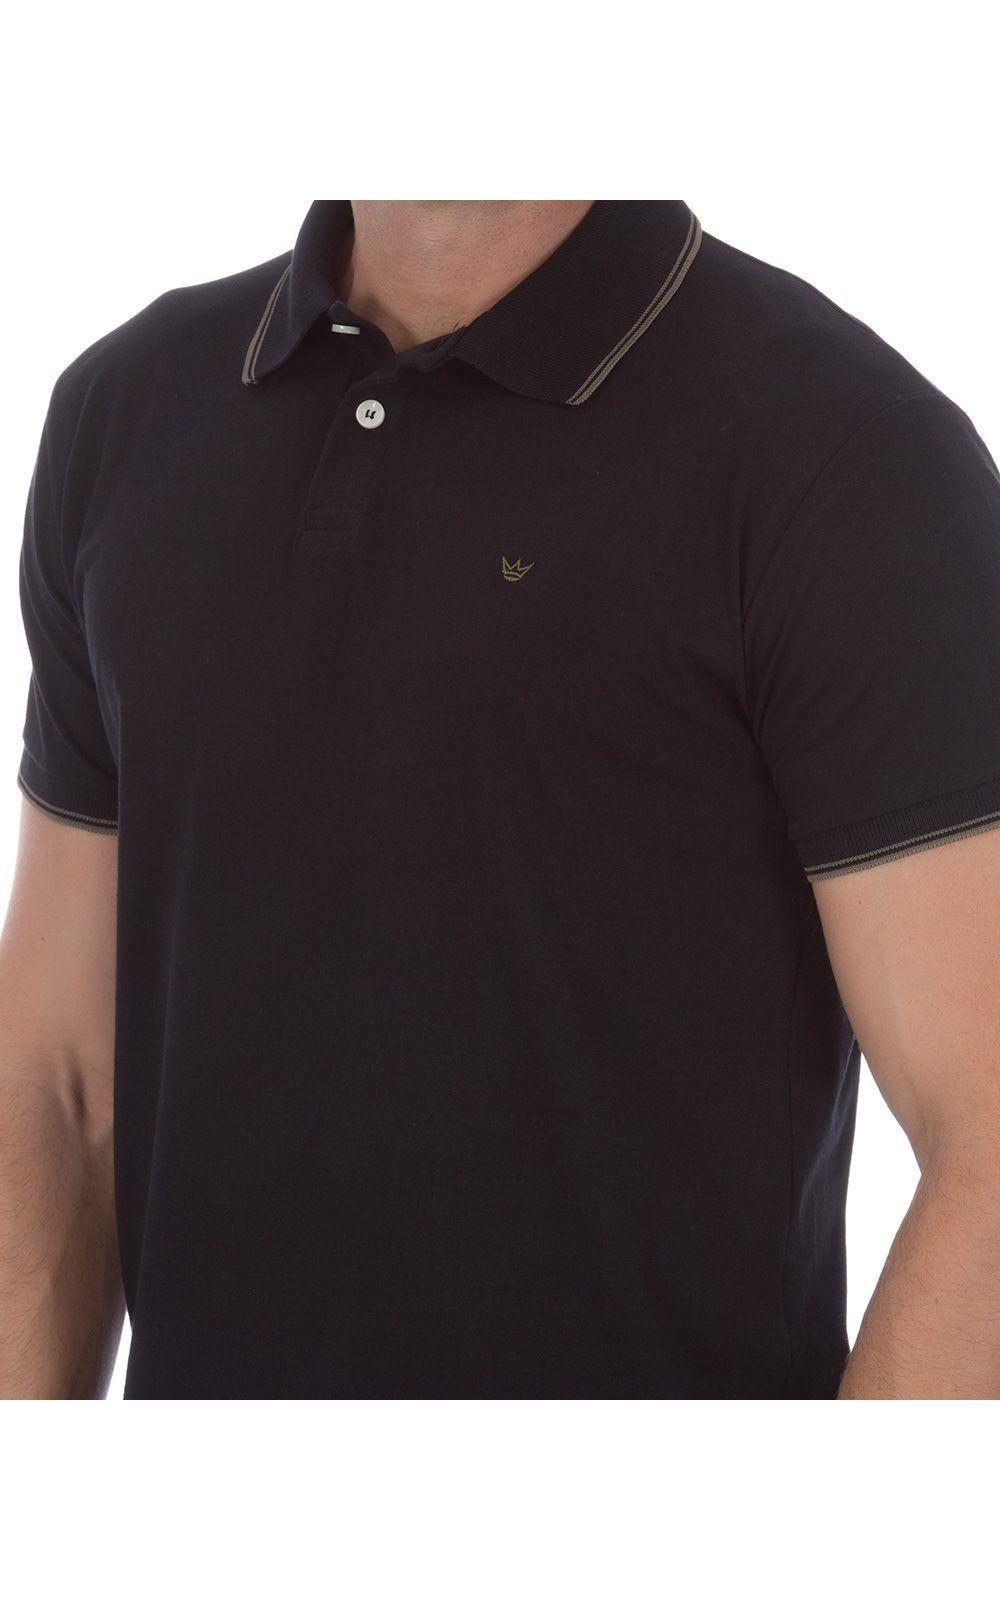 Foto 3 - Camisa Polo Masculina Preta Detalhada